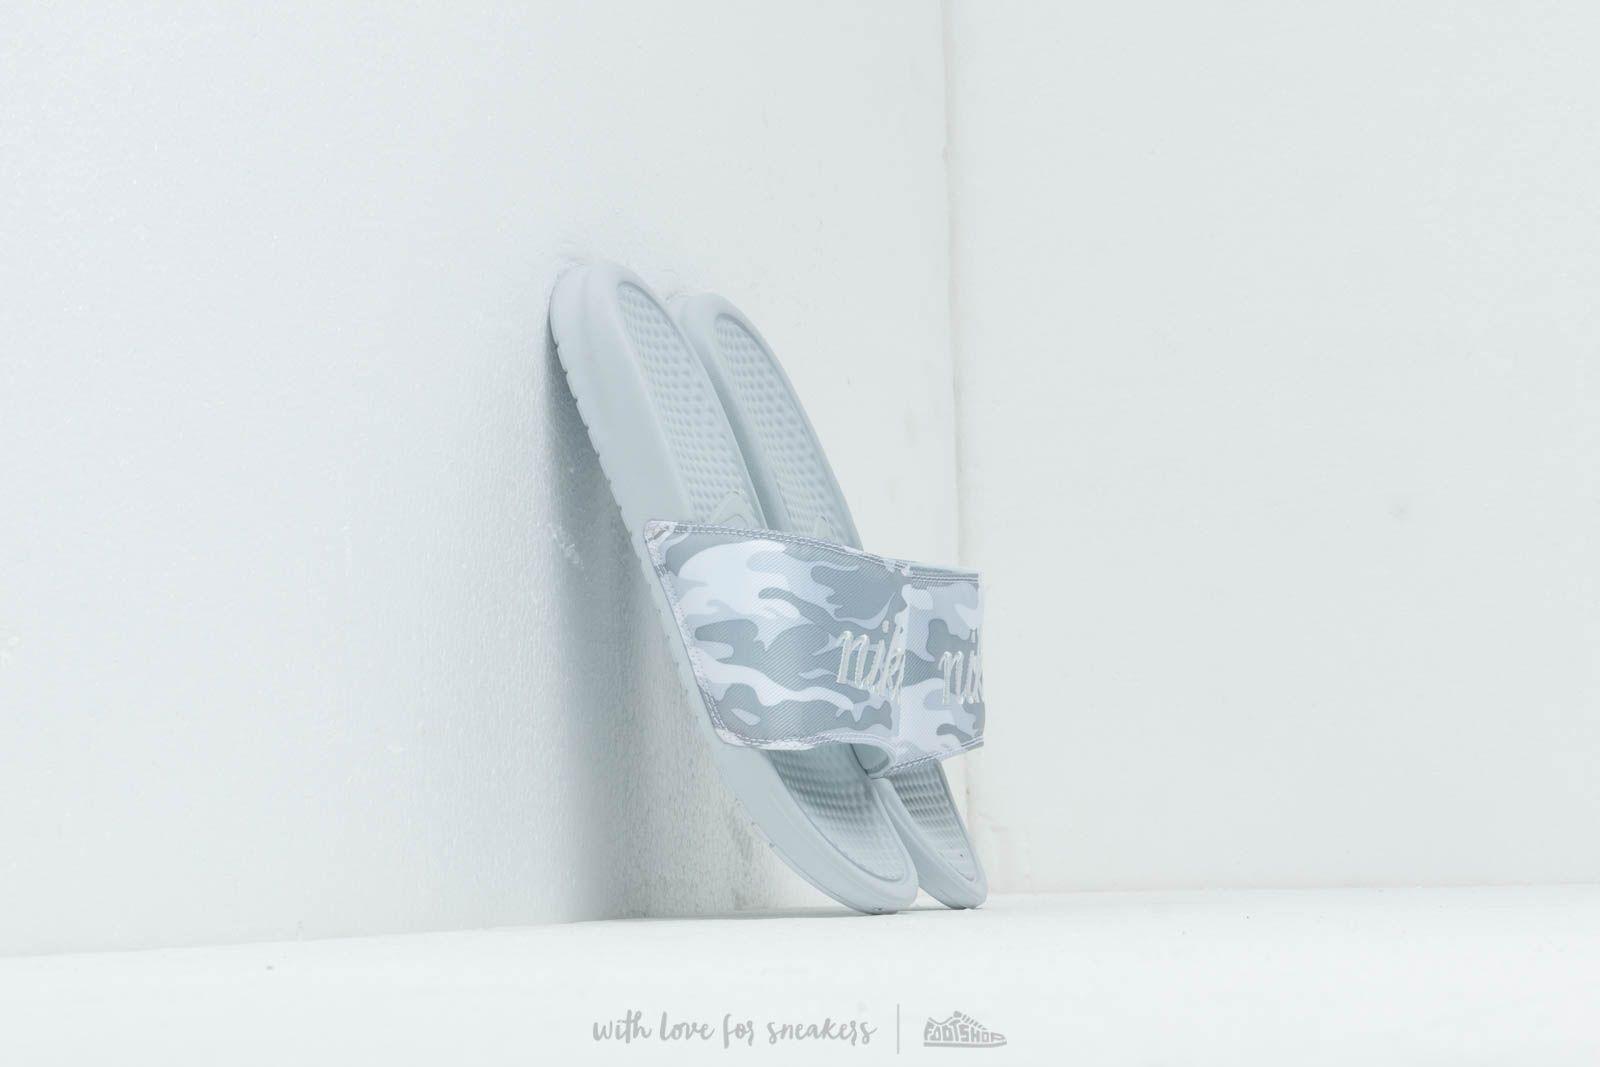 Dámské tenisky a boty Nike Wmns Benassi Jdi Txt Se Pure Platinum/ Mtlc Platinum-White